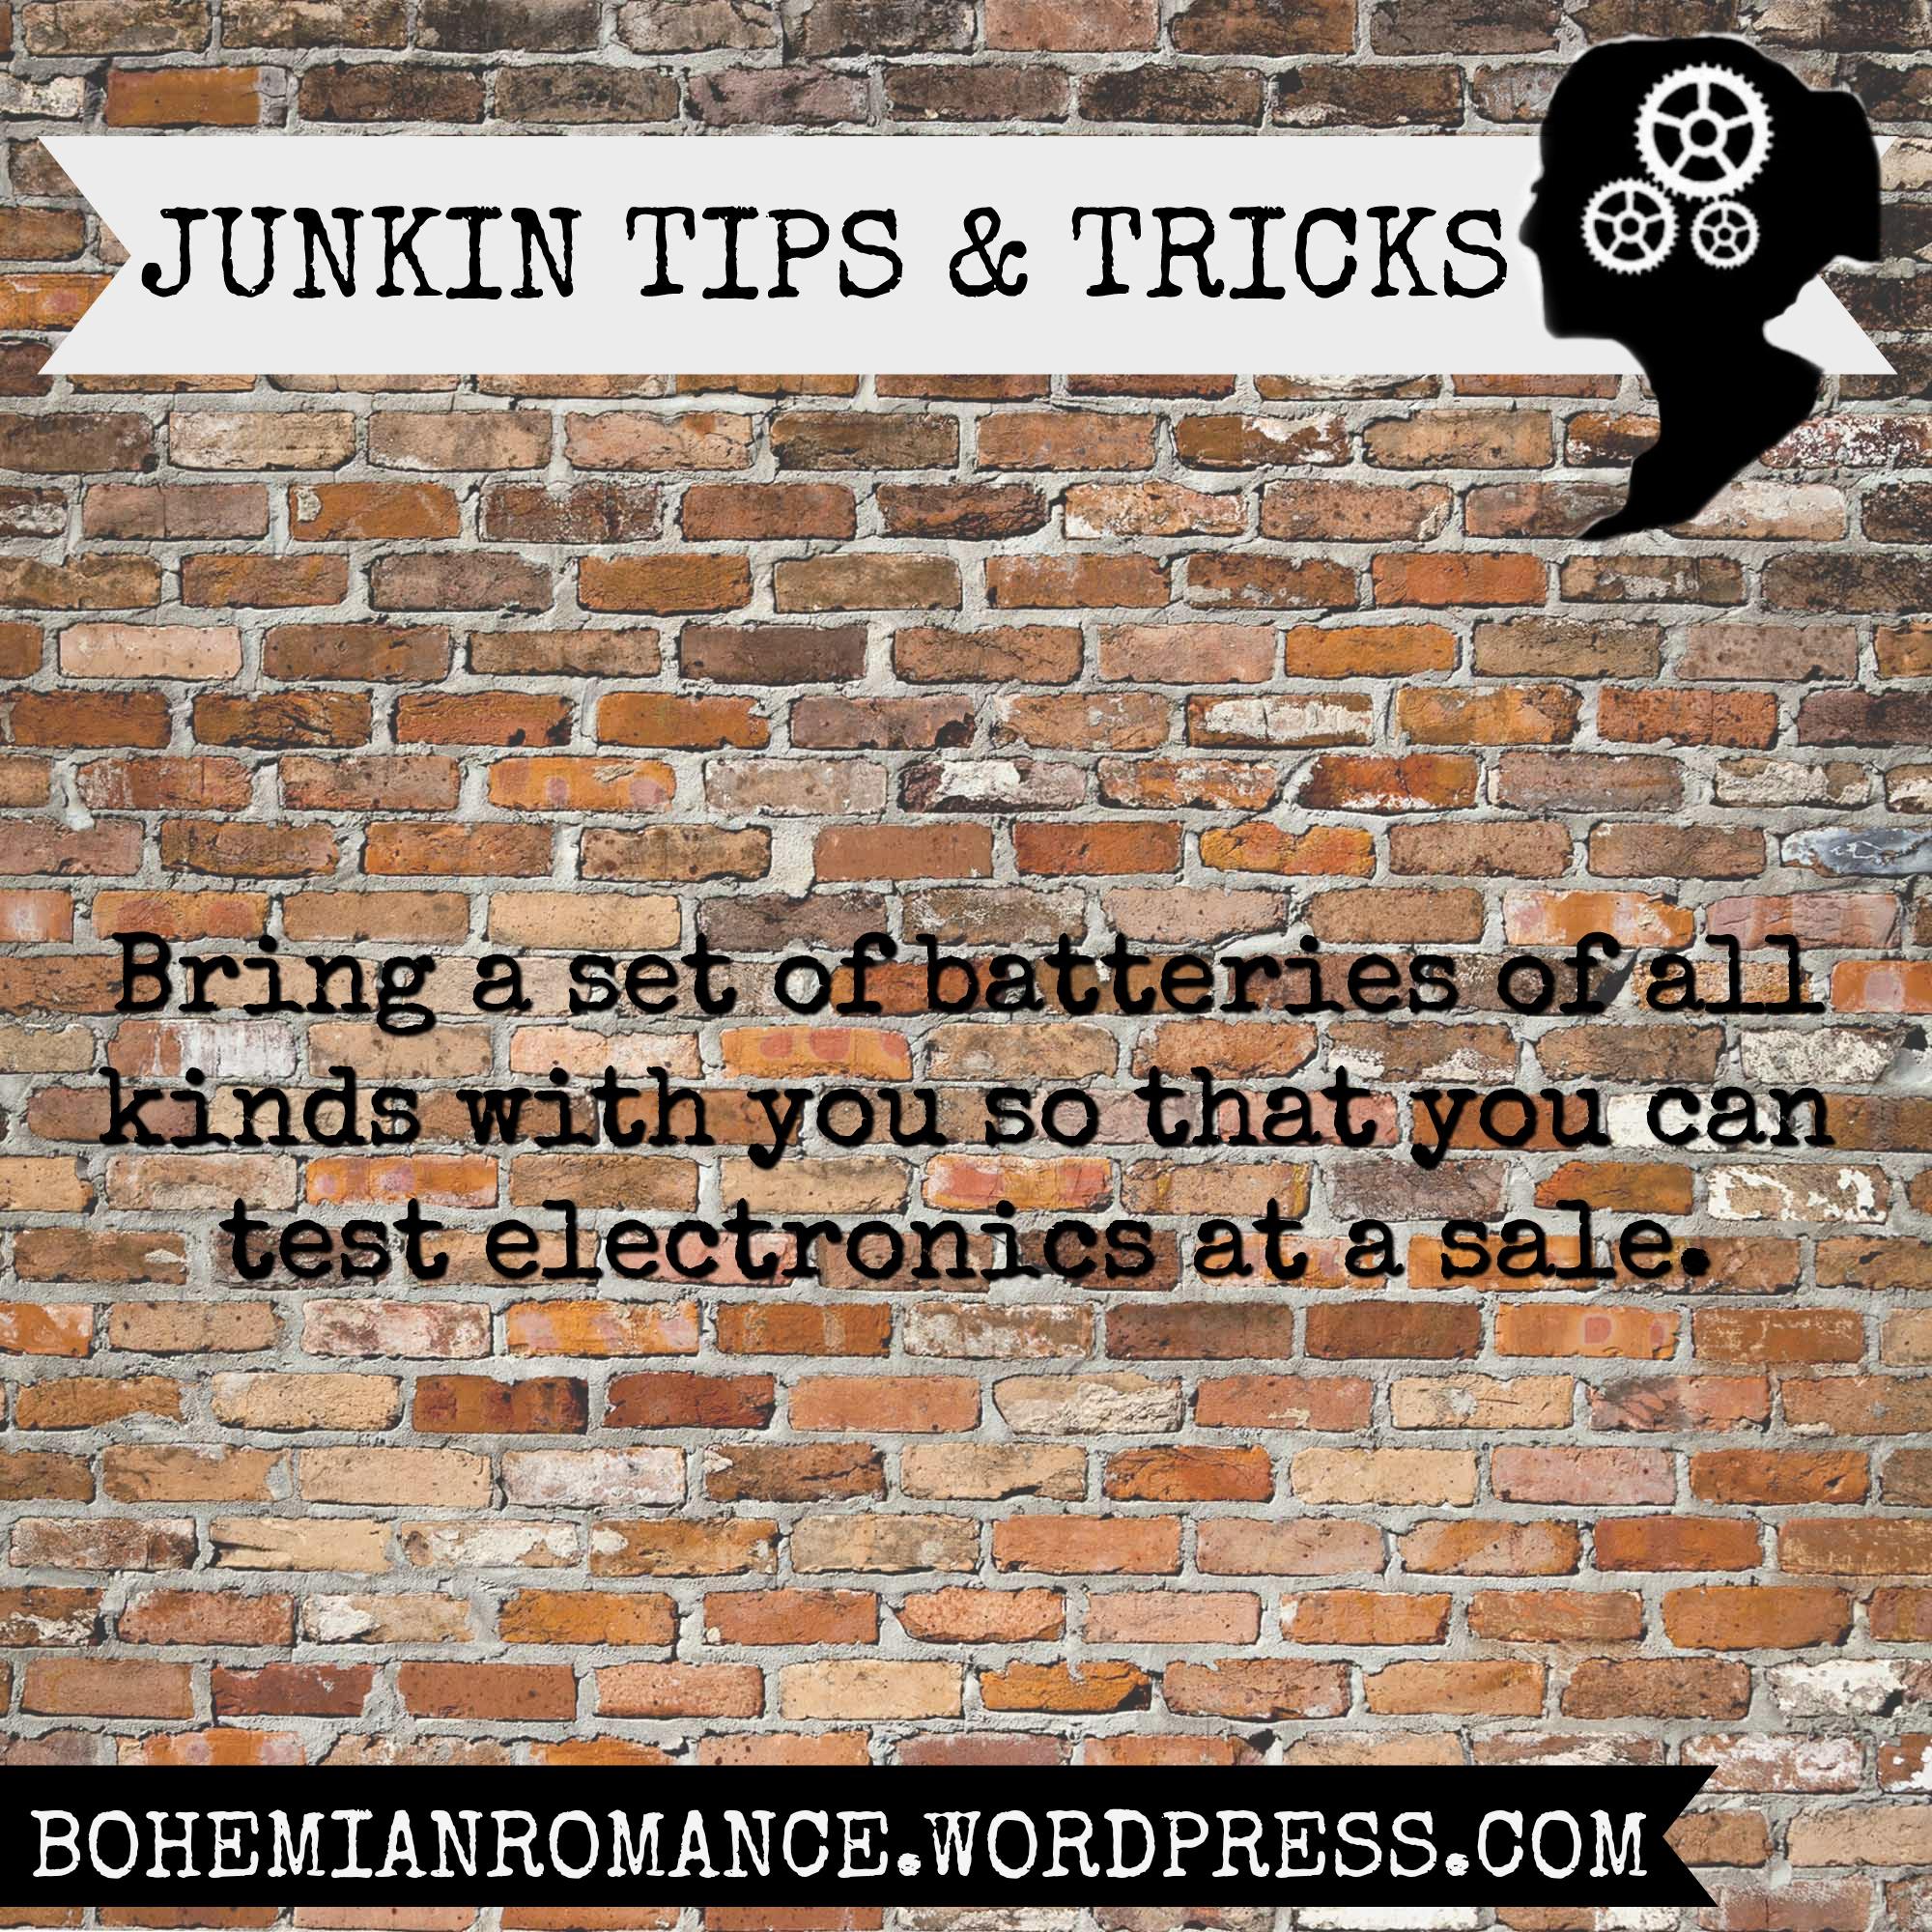 15-junkin-tips-tricks-template